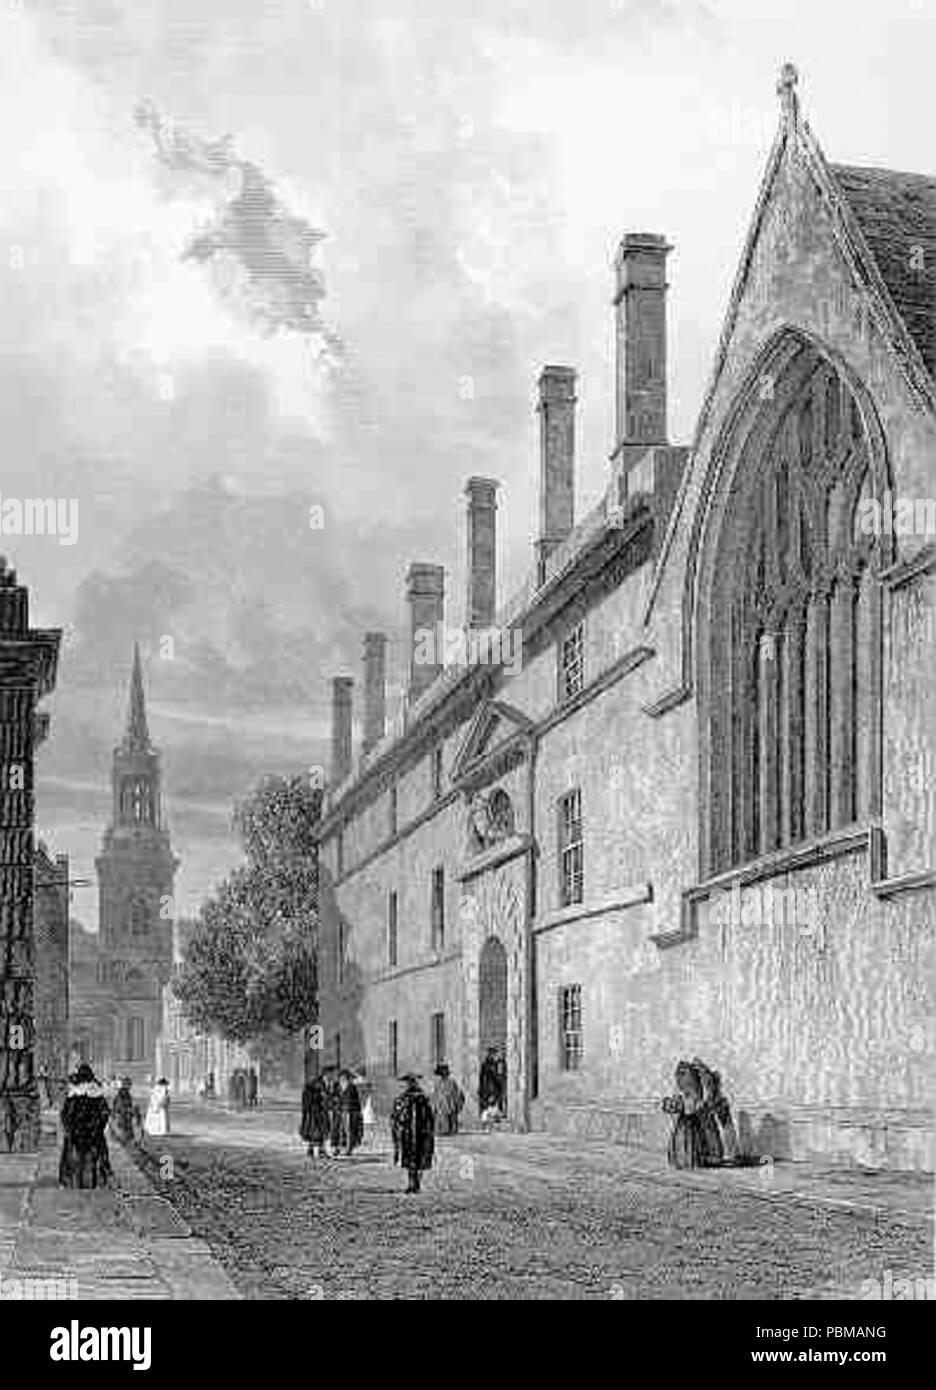 832 Jesus College engraving 1839 - Stock Image